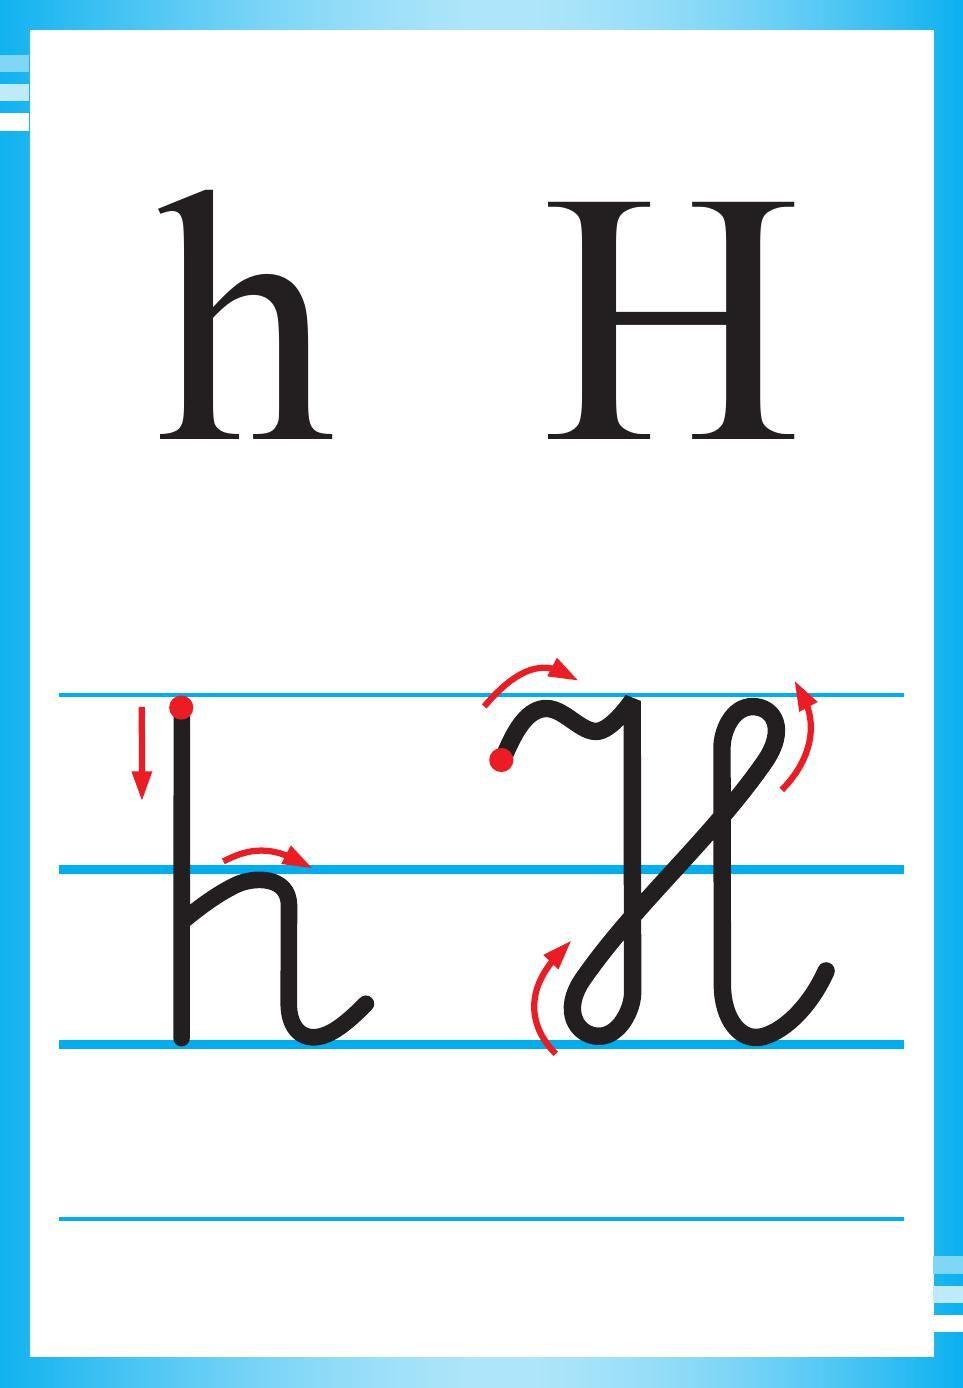 Alfabet Polski Pisany Dla Dzieci Do Druku 17 Lettering Kids Learning Learning